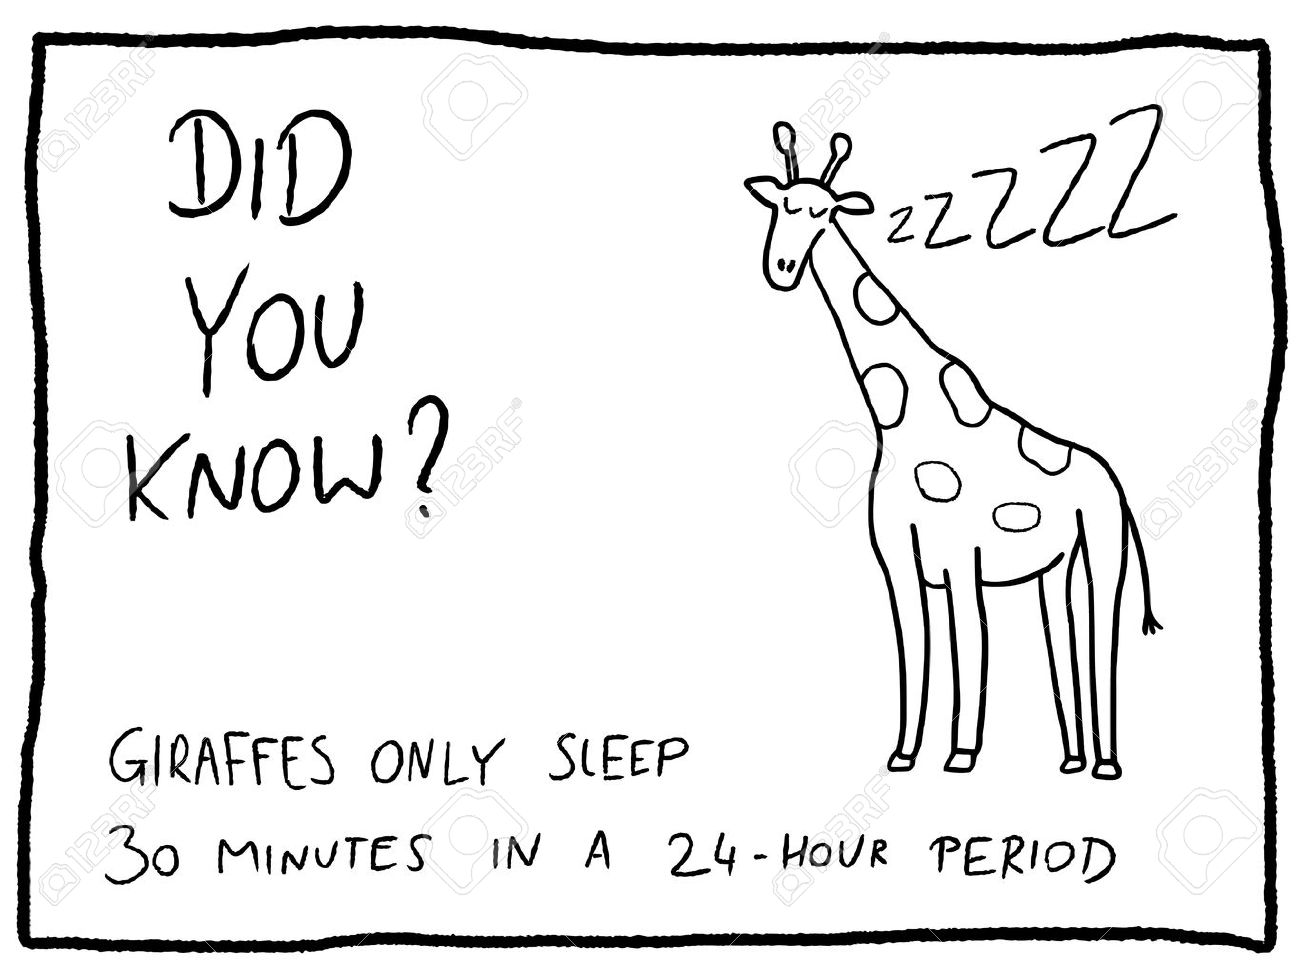 Animal facts about giraffe - fun trivia cartoon doodle concept. Newspaper funny comic fact. - 64860644